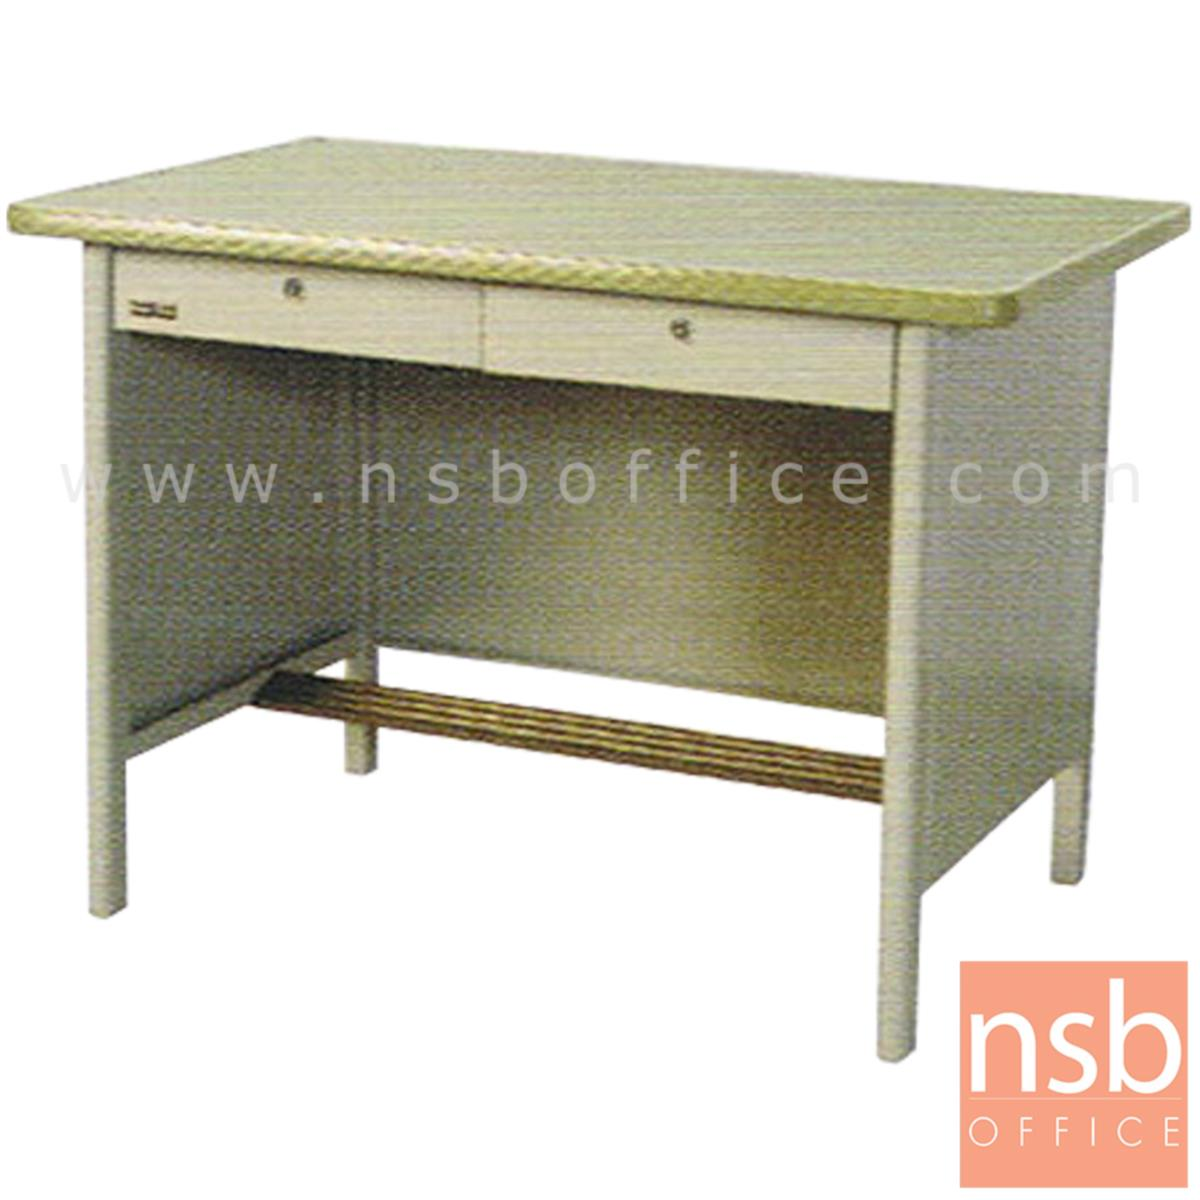 E06A013:โต๊ะทำงานเหล็ก 2 ลิ้นชัก รุ่น M-13,M-14,M-15,M-11,M-12  พร้อมกระจก